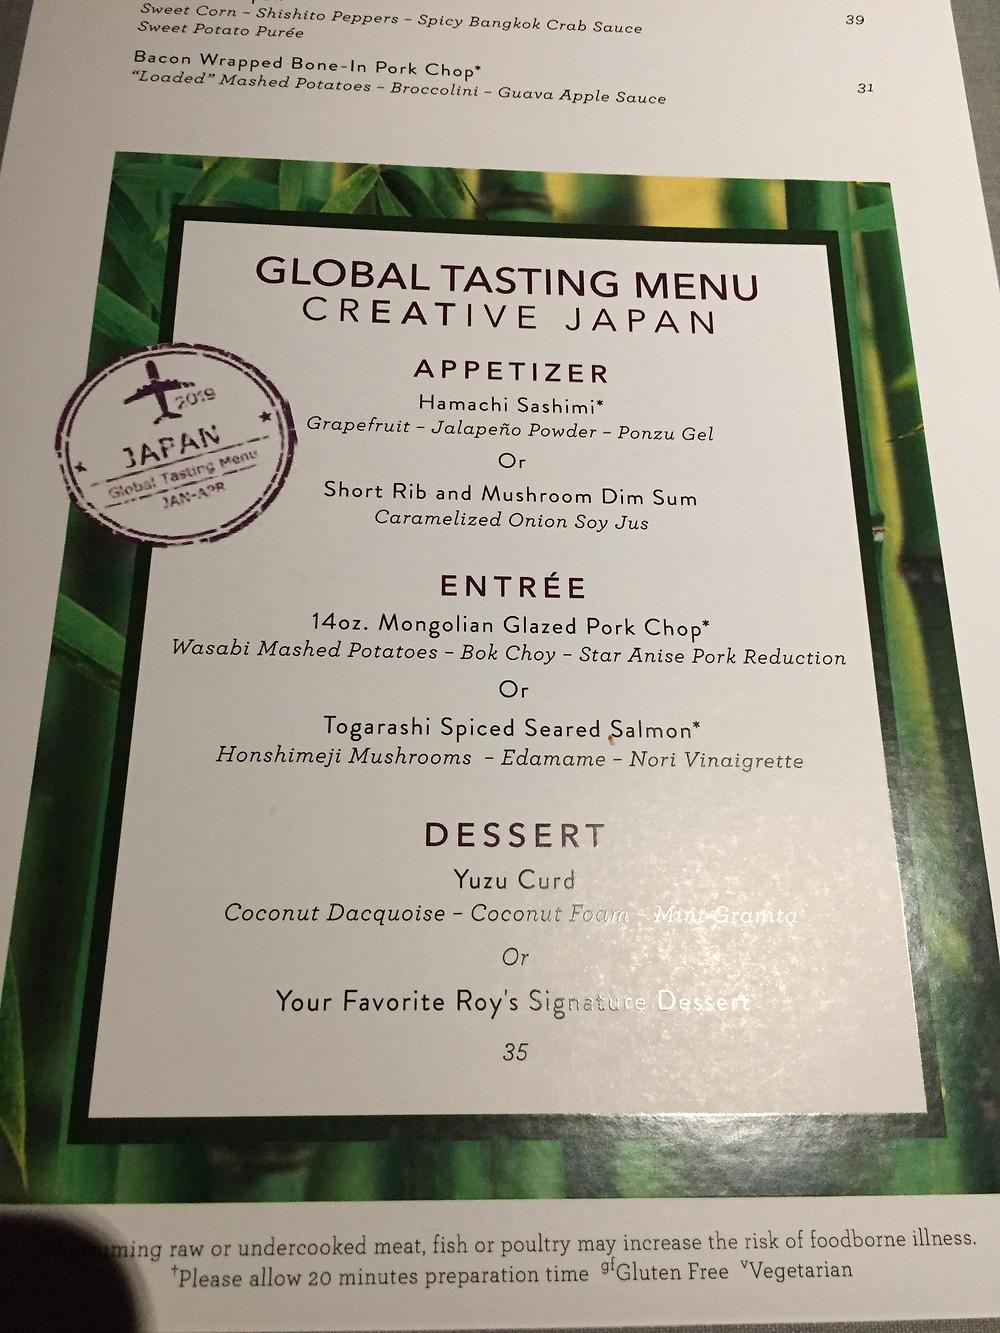 Global Tasting Menu 'Creative Japan'